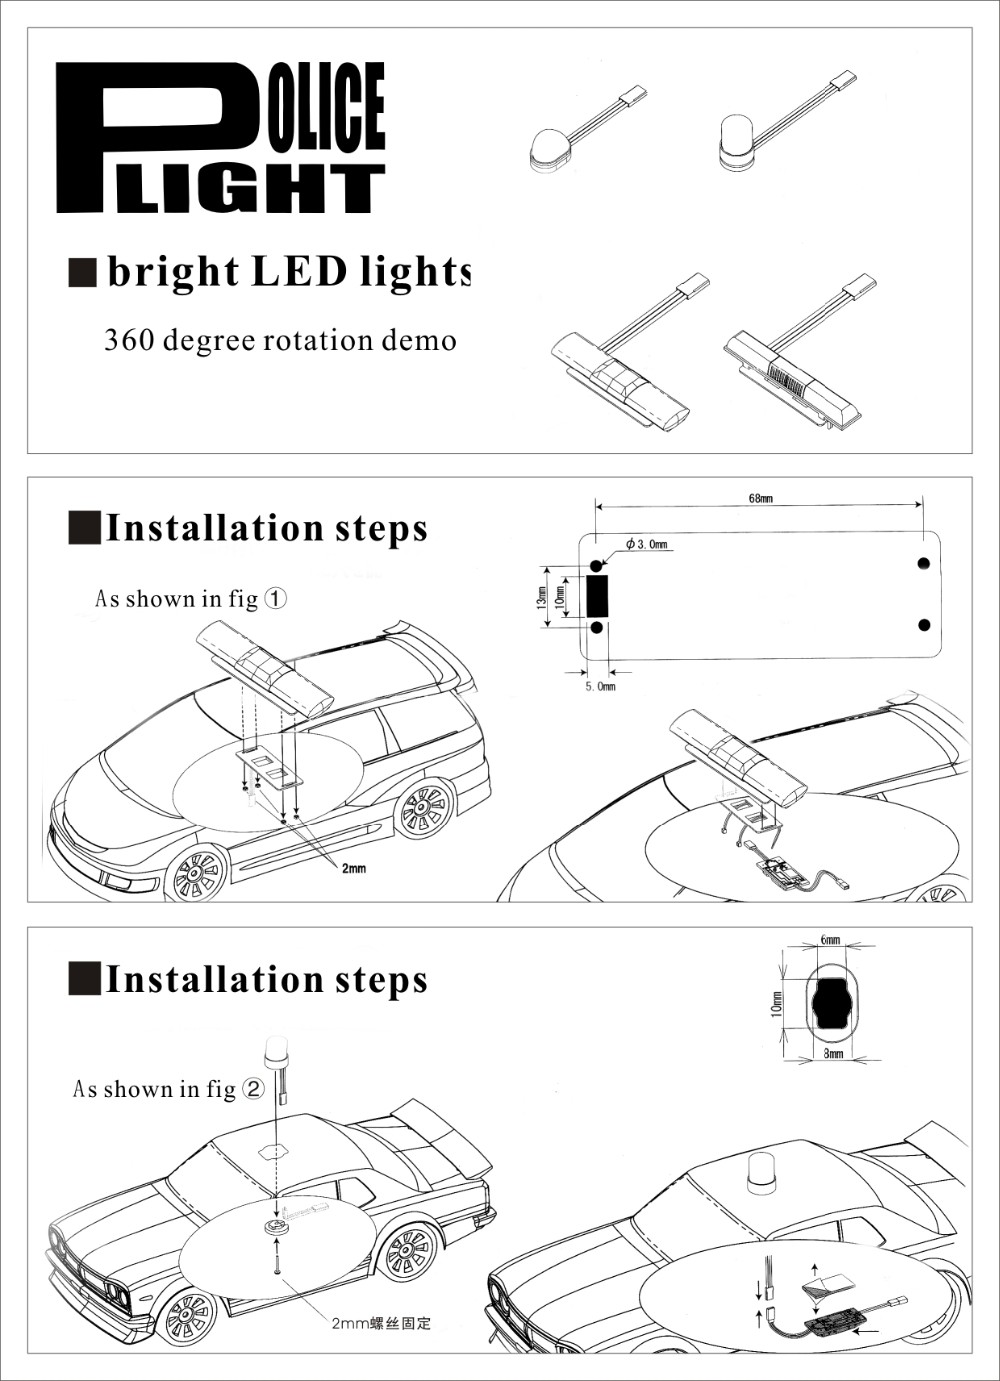 Rc Multi-function Ultra Bright Police Led Light Car Kit